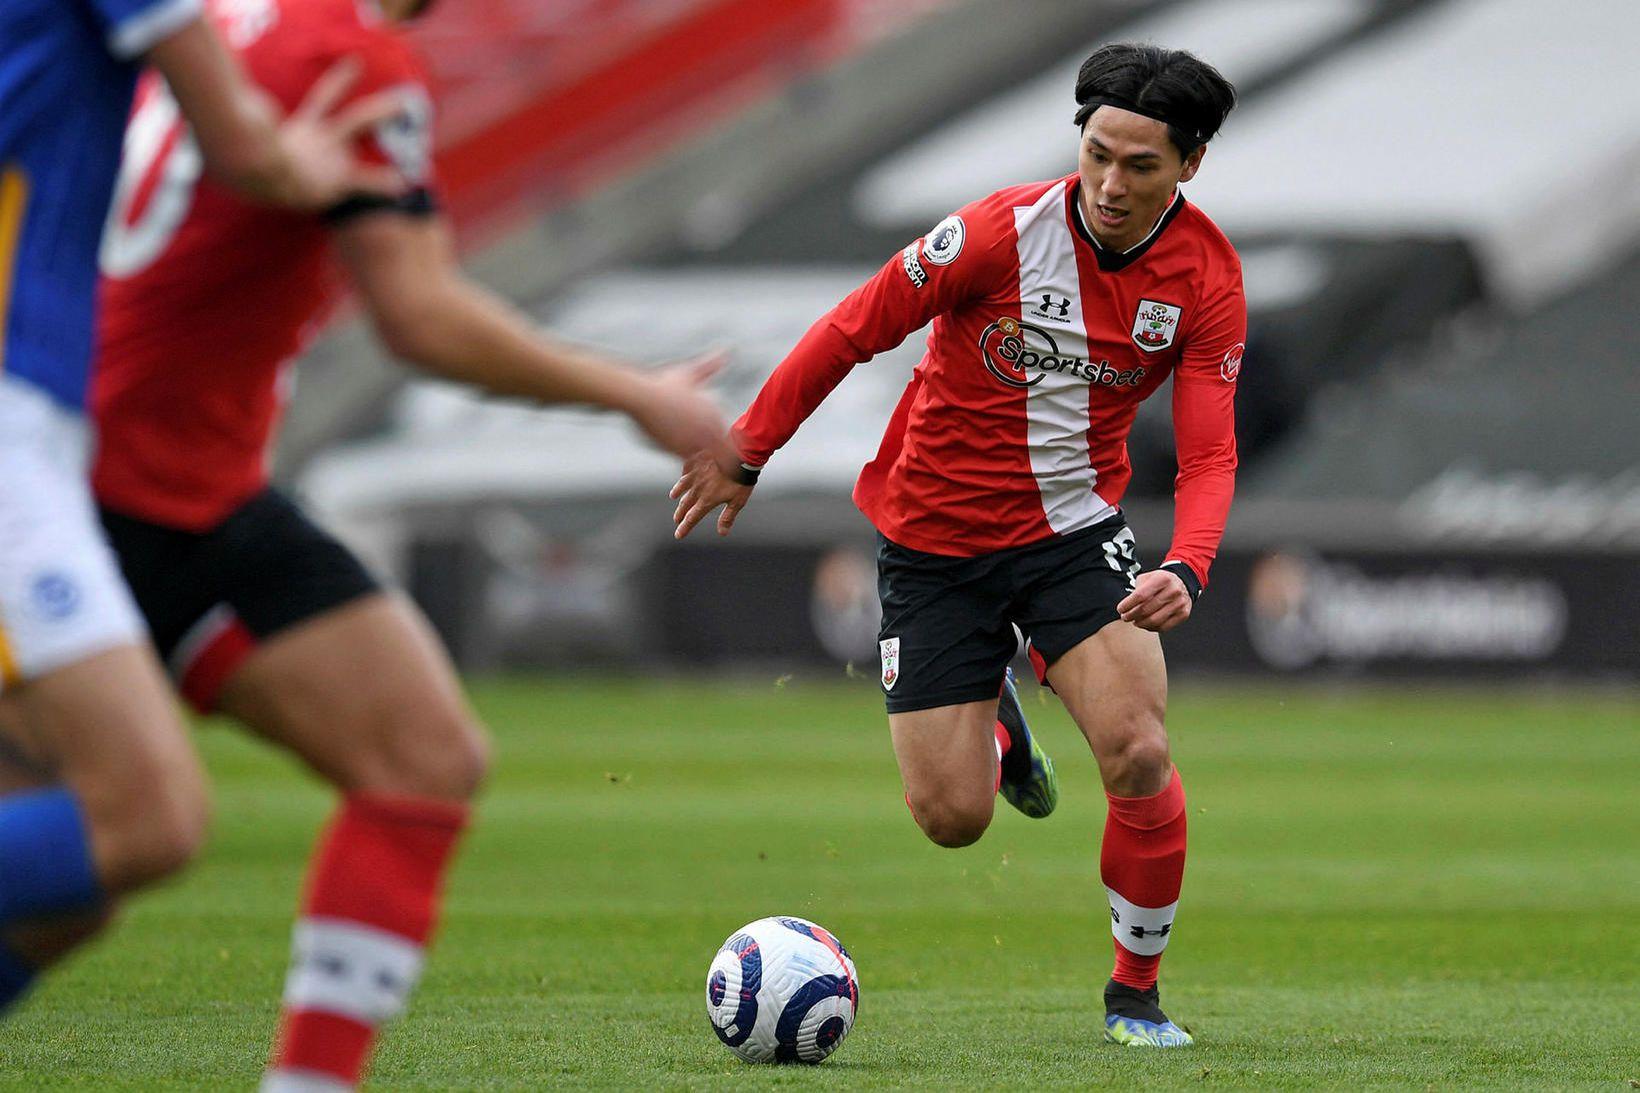 Takumi Minamino fer aftur til Liverpool þegar lánssamningi hans við …